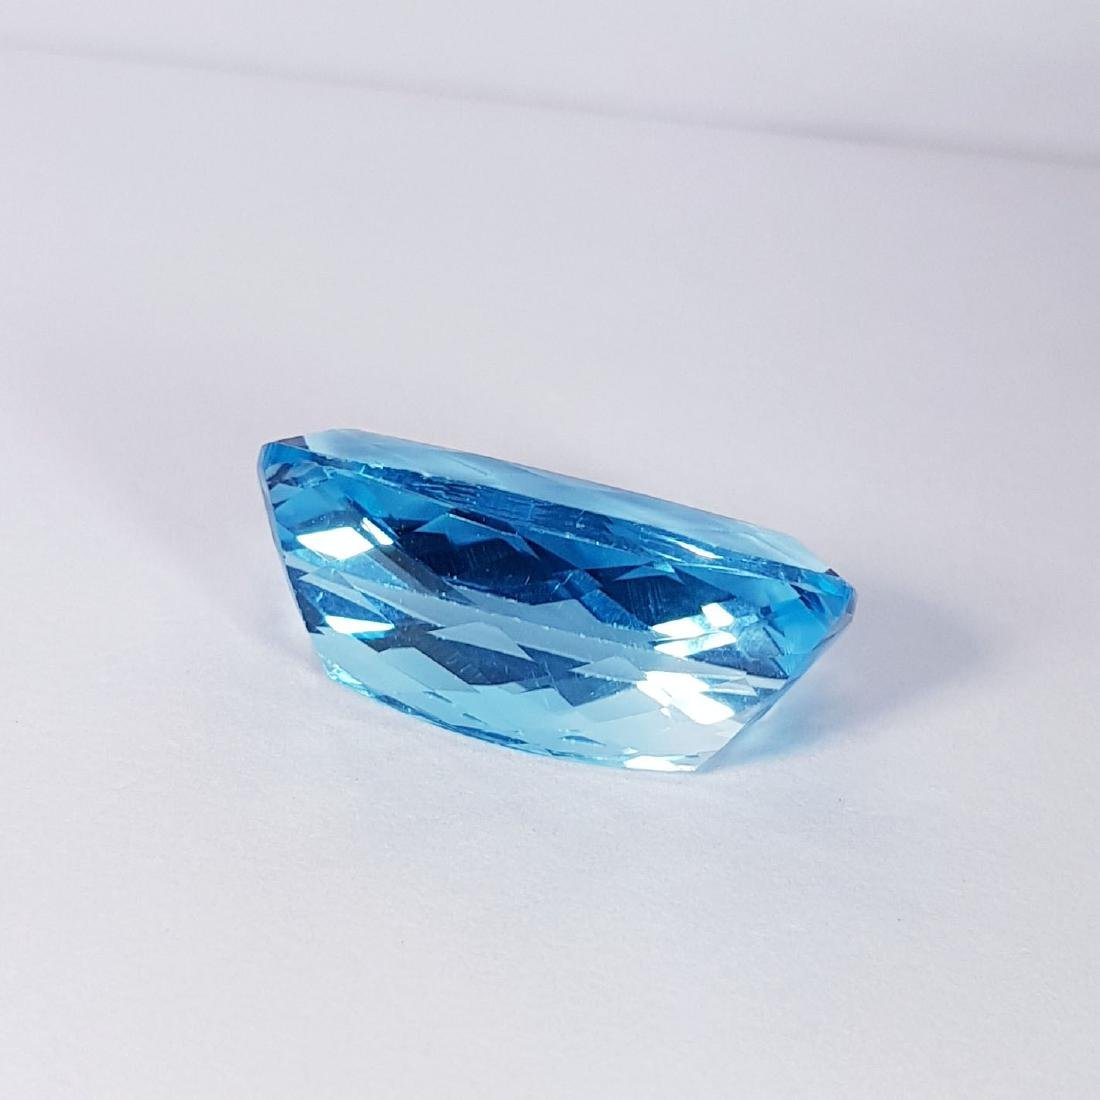 Natural Swiss Blue Topaz - 25.16 ct - 4